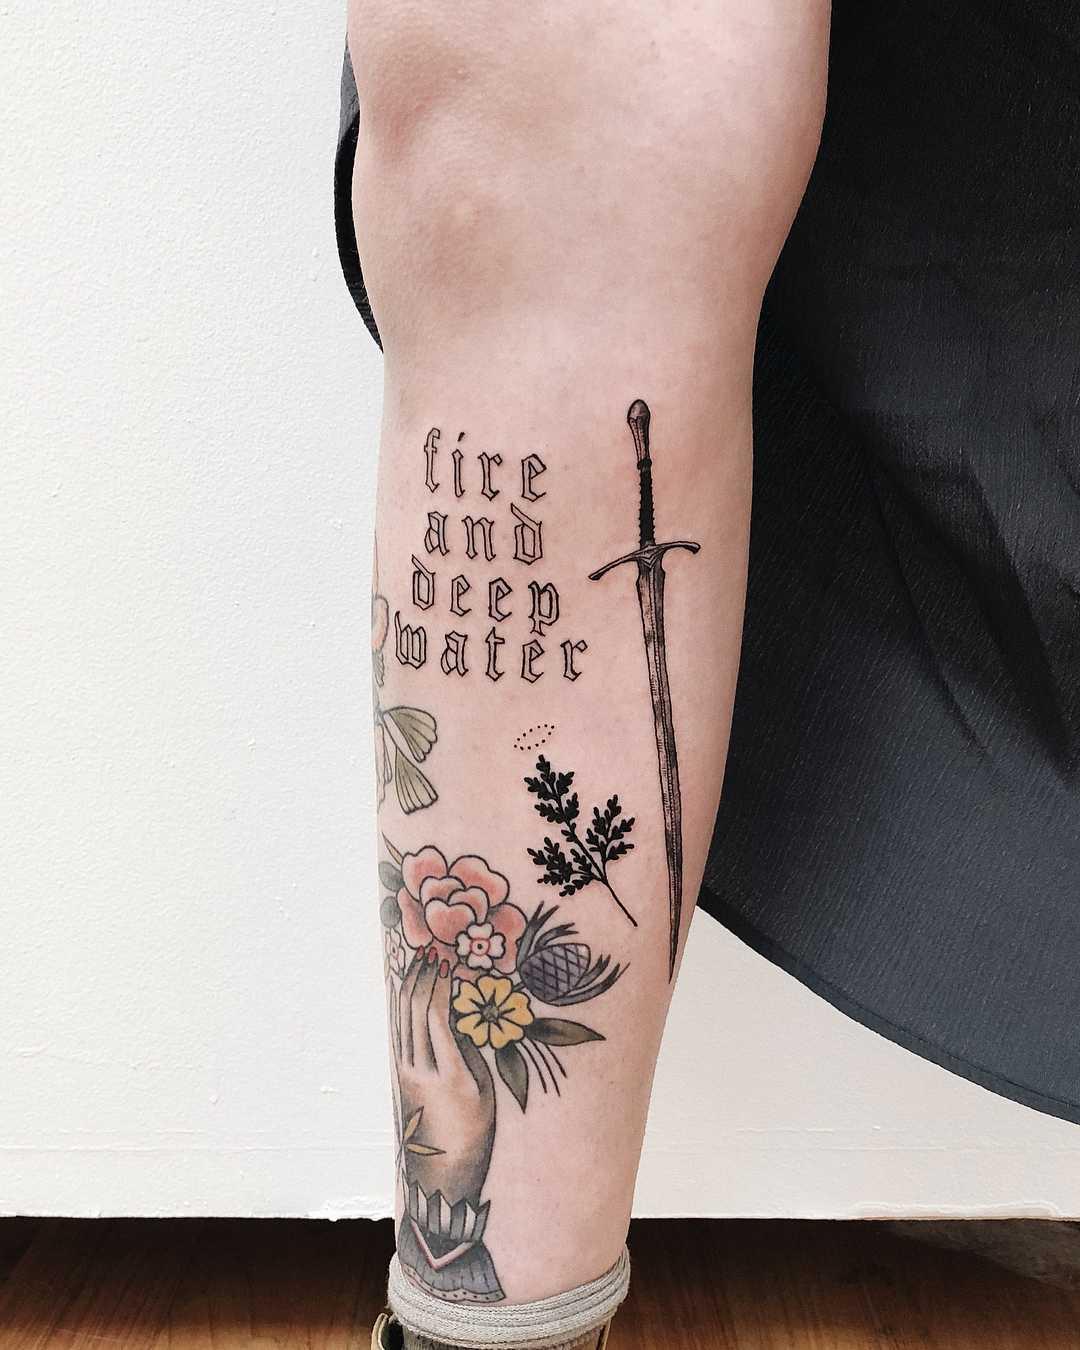 Gandalf's sword Glamdring tattoo